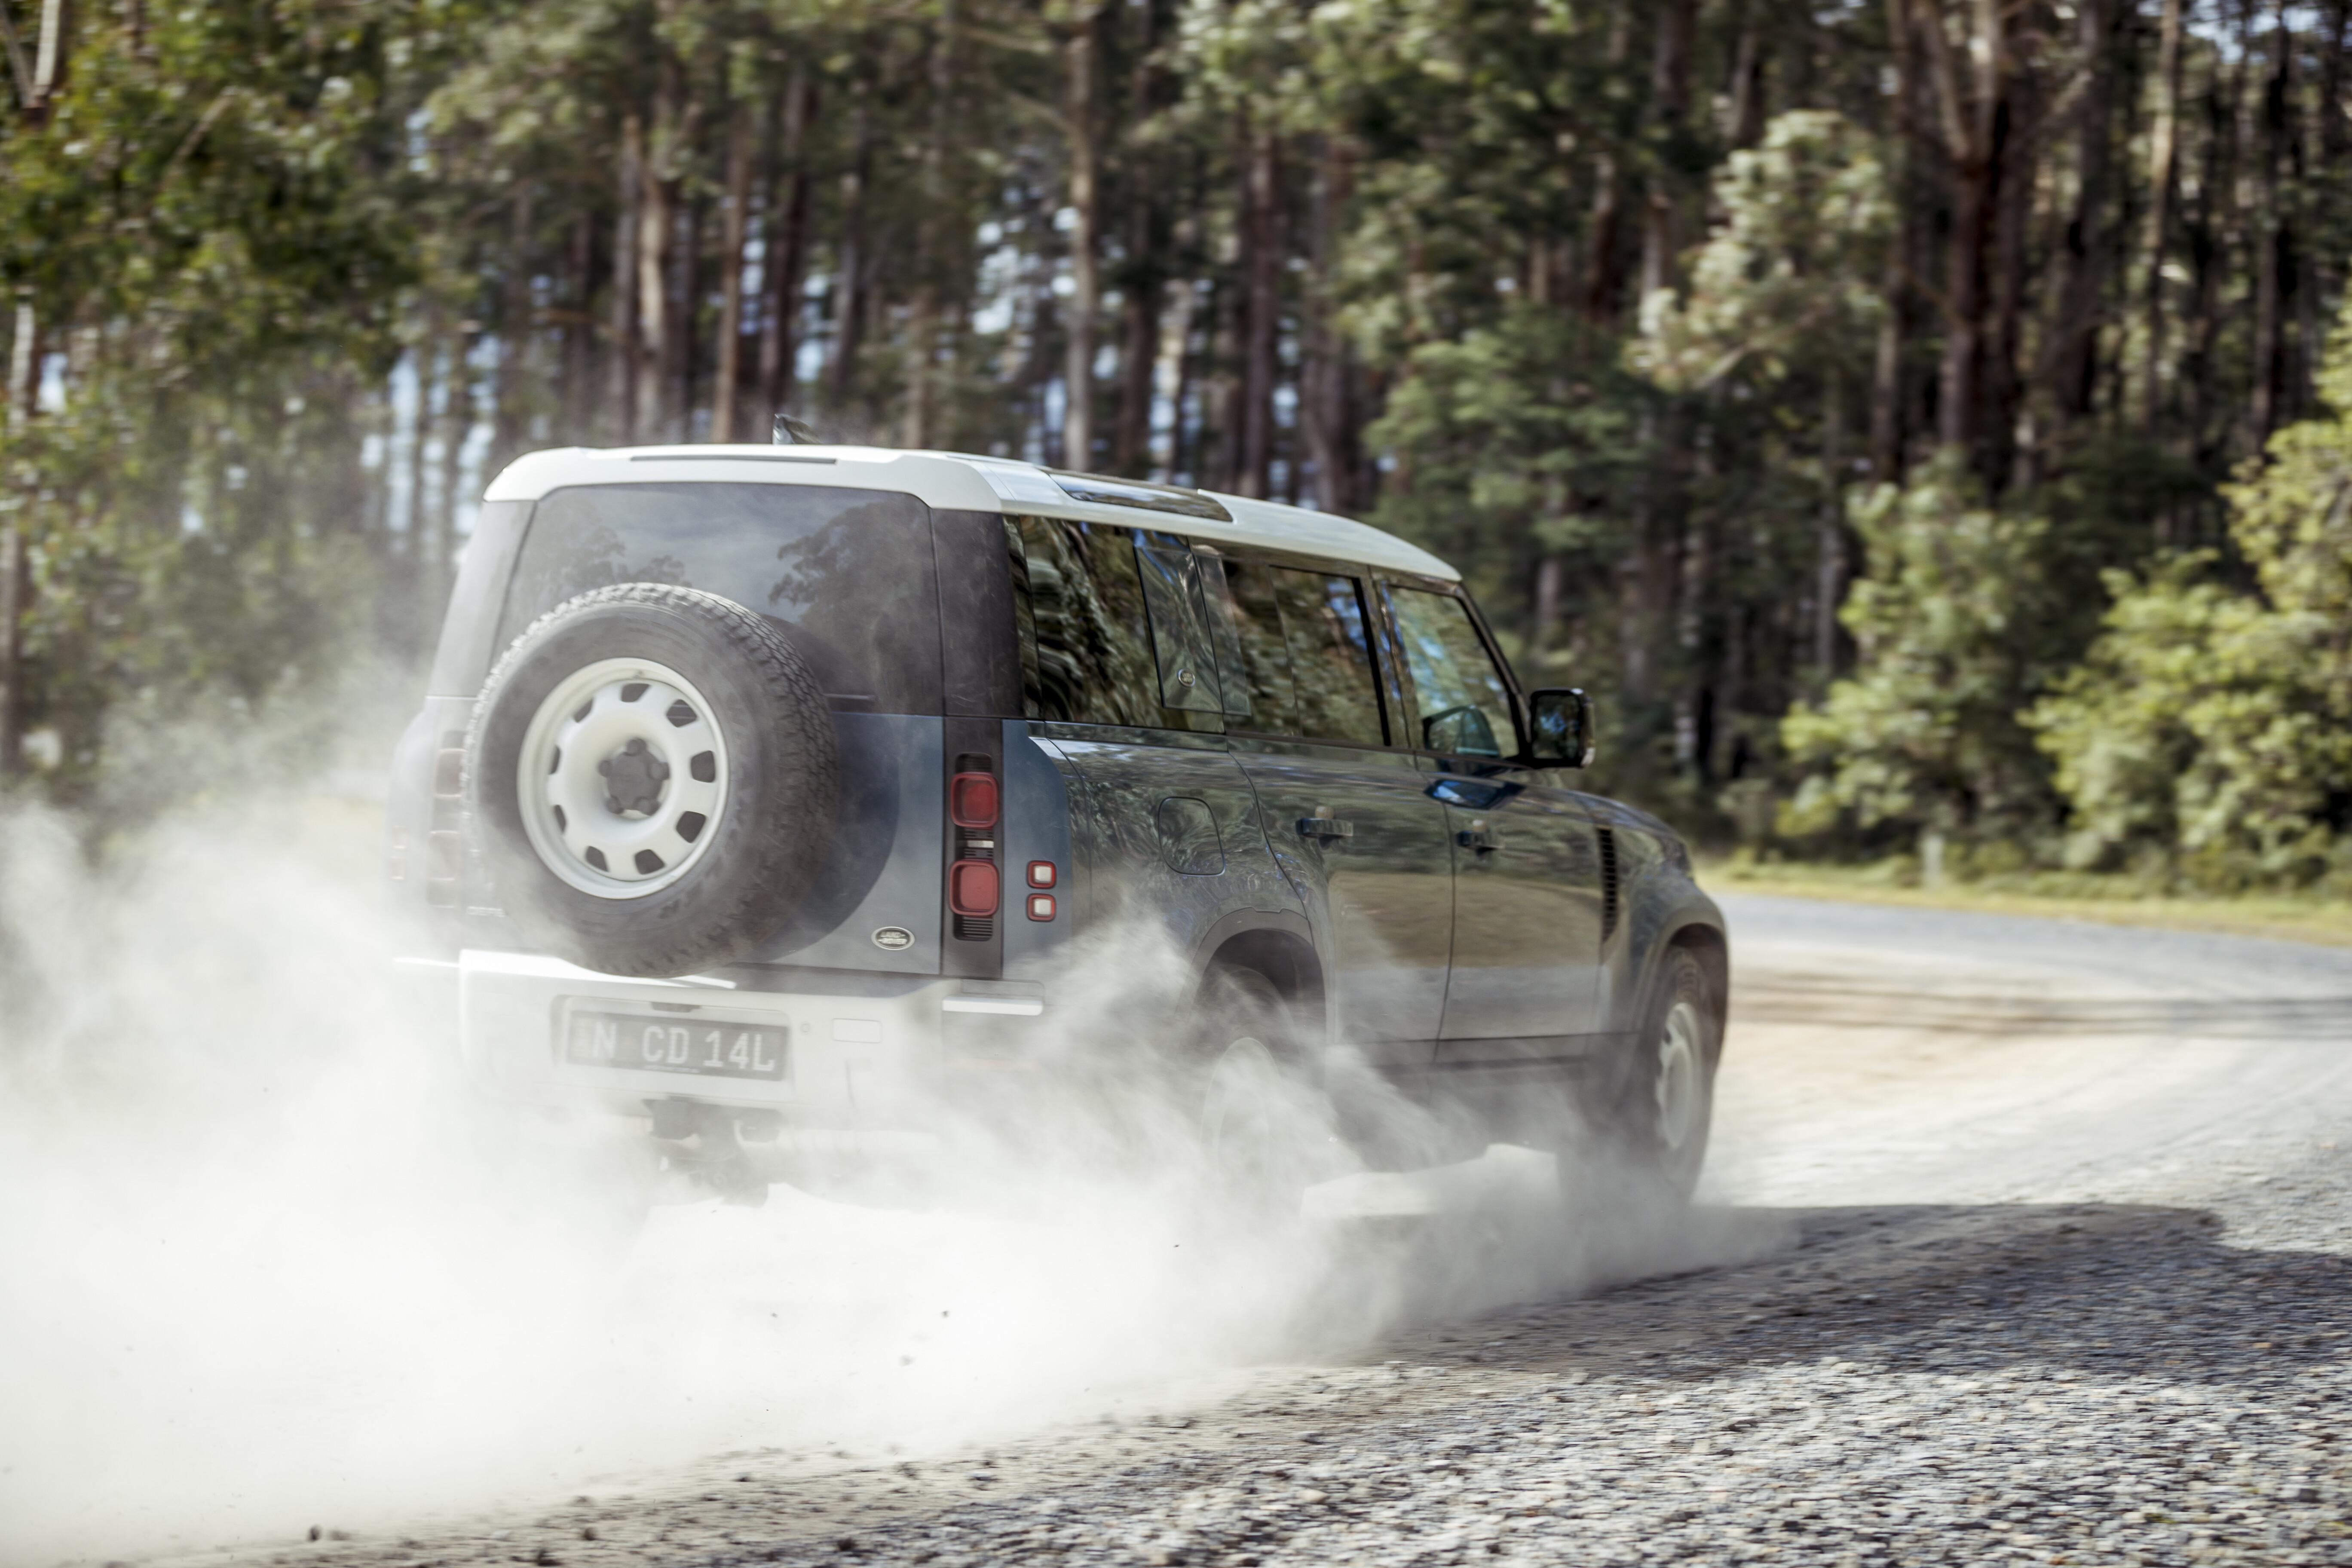 4 X 4 Australia Reviews 2021 June 2021 2021 Land Rover Defender 110 D 250 S 49